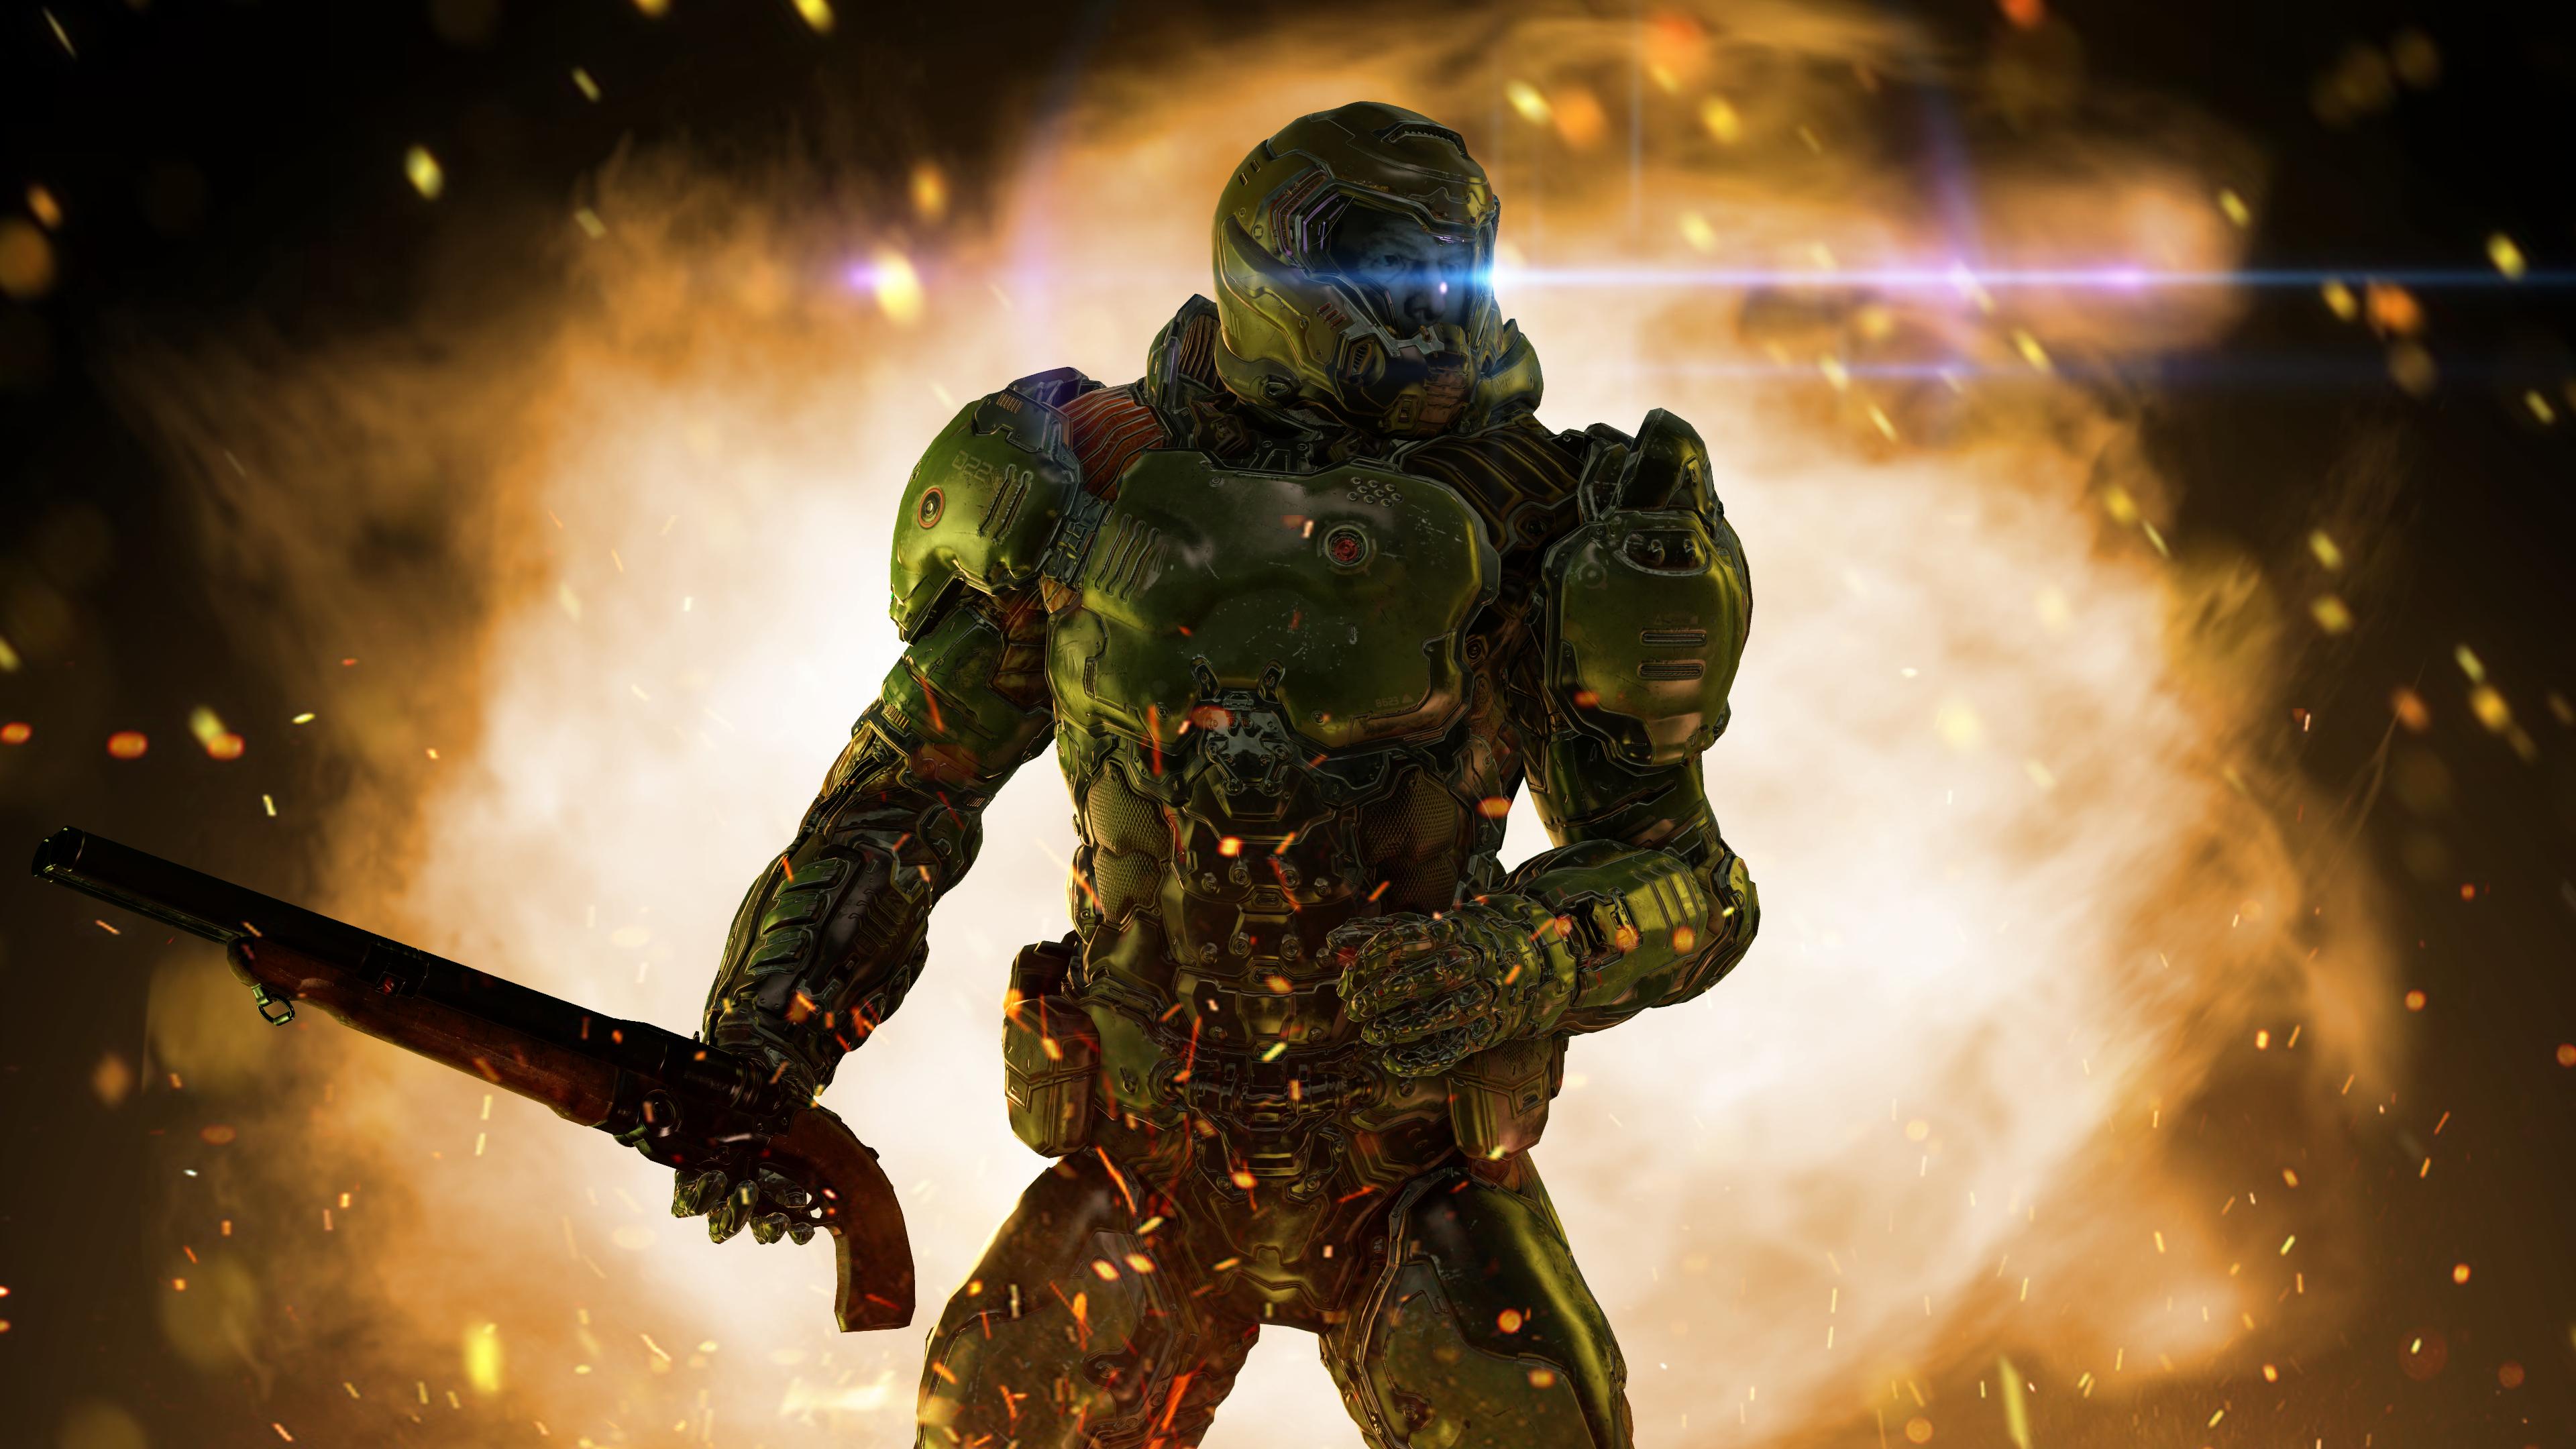 Doom Slayer By Elmensfm On Deviantart